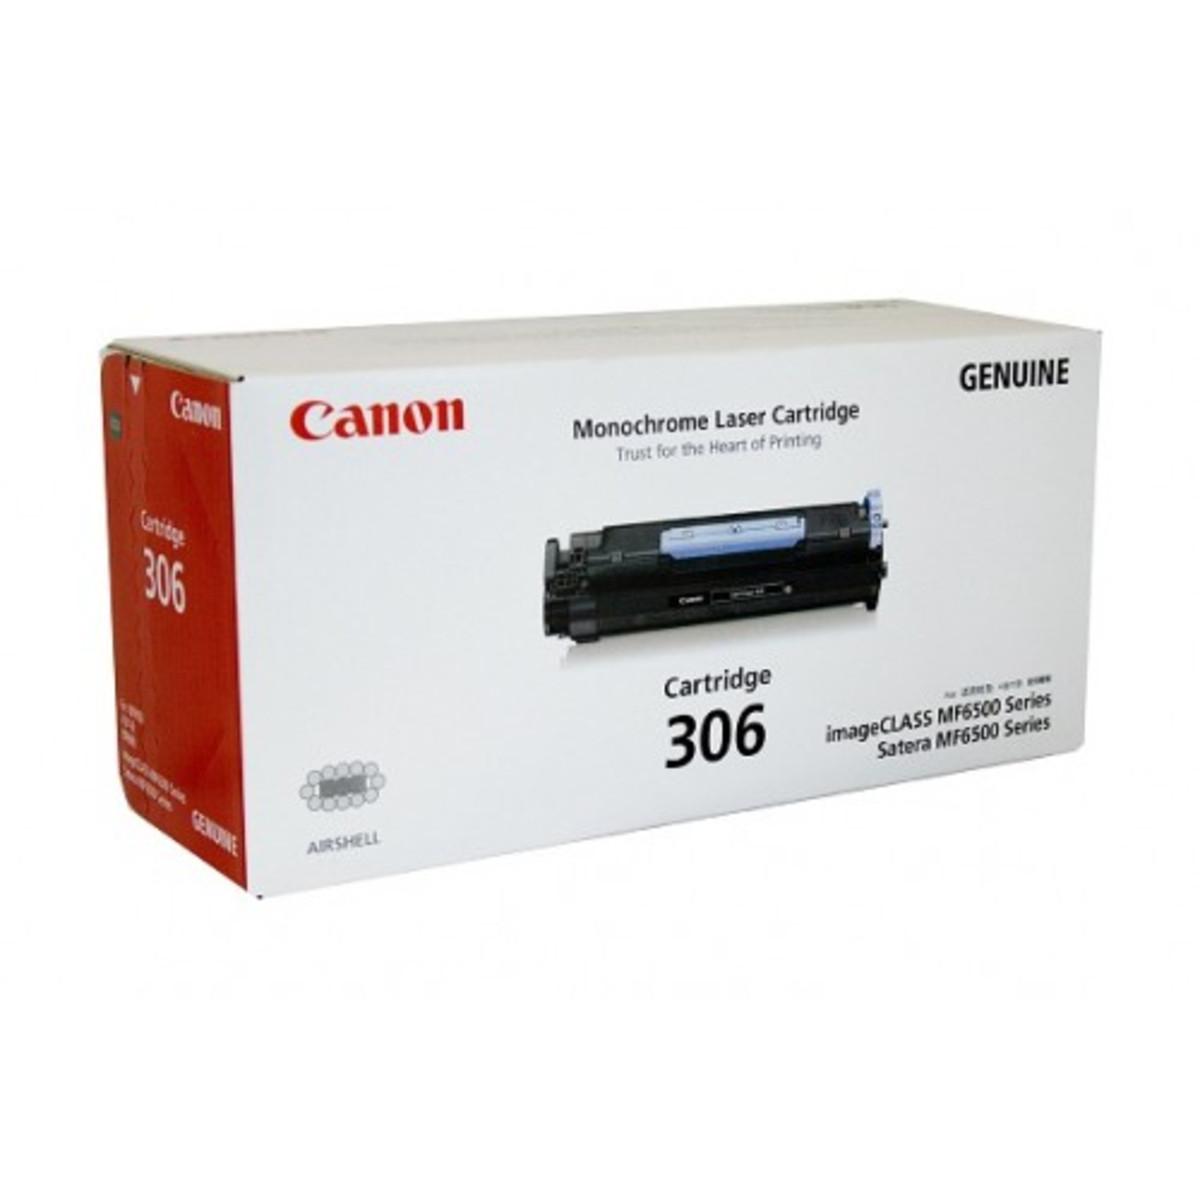 Canon CART-306 Black Toner Cartridge